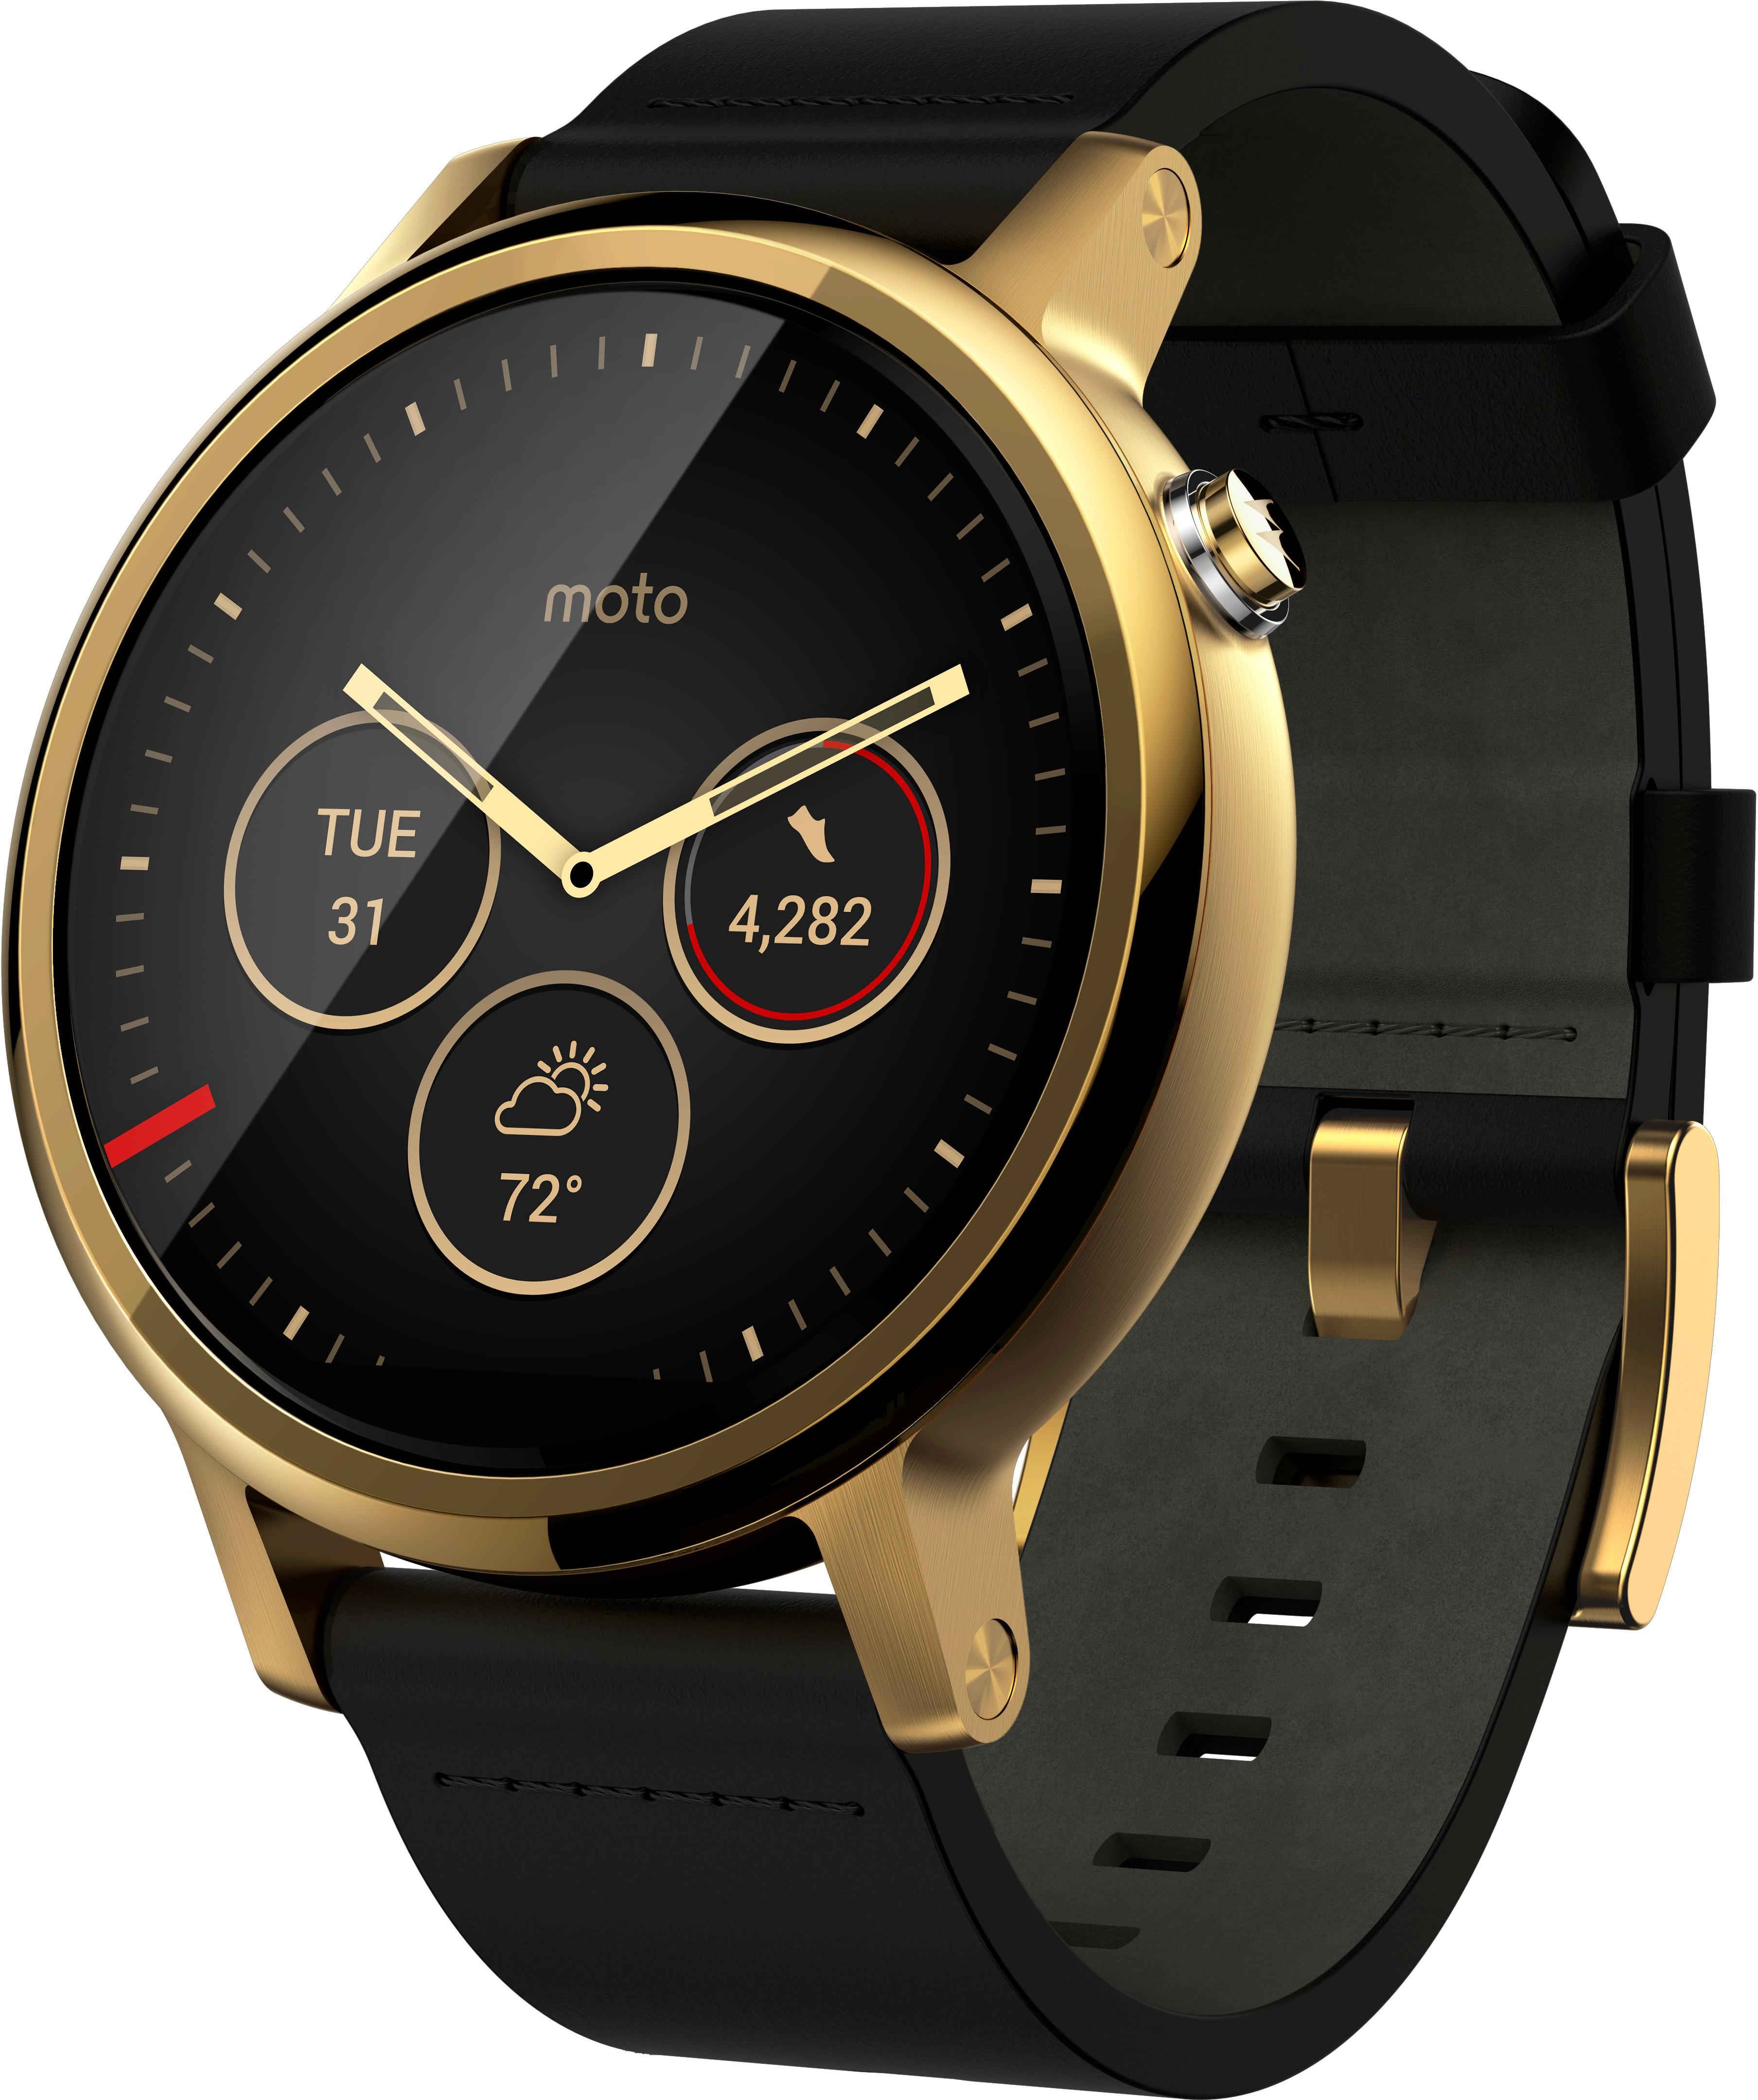 Deals - Hisar - Top Smartwatches <br> Asus, Moto, Apple & more.<br> Category - wearable_smart_devices<br> Business - Flipkart.com